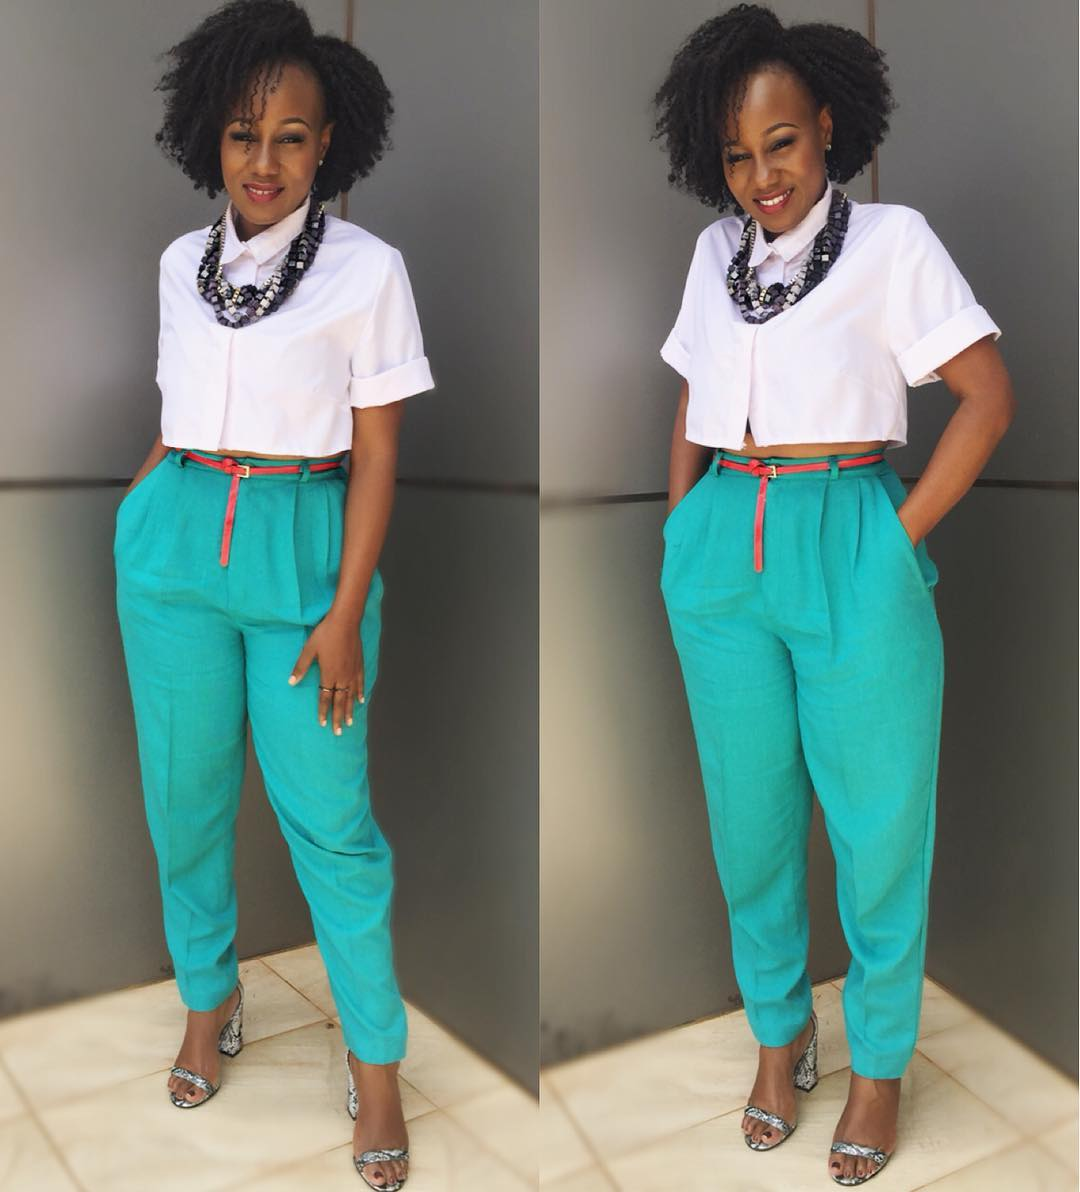 Television host Judithiana Lands juicy deal